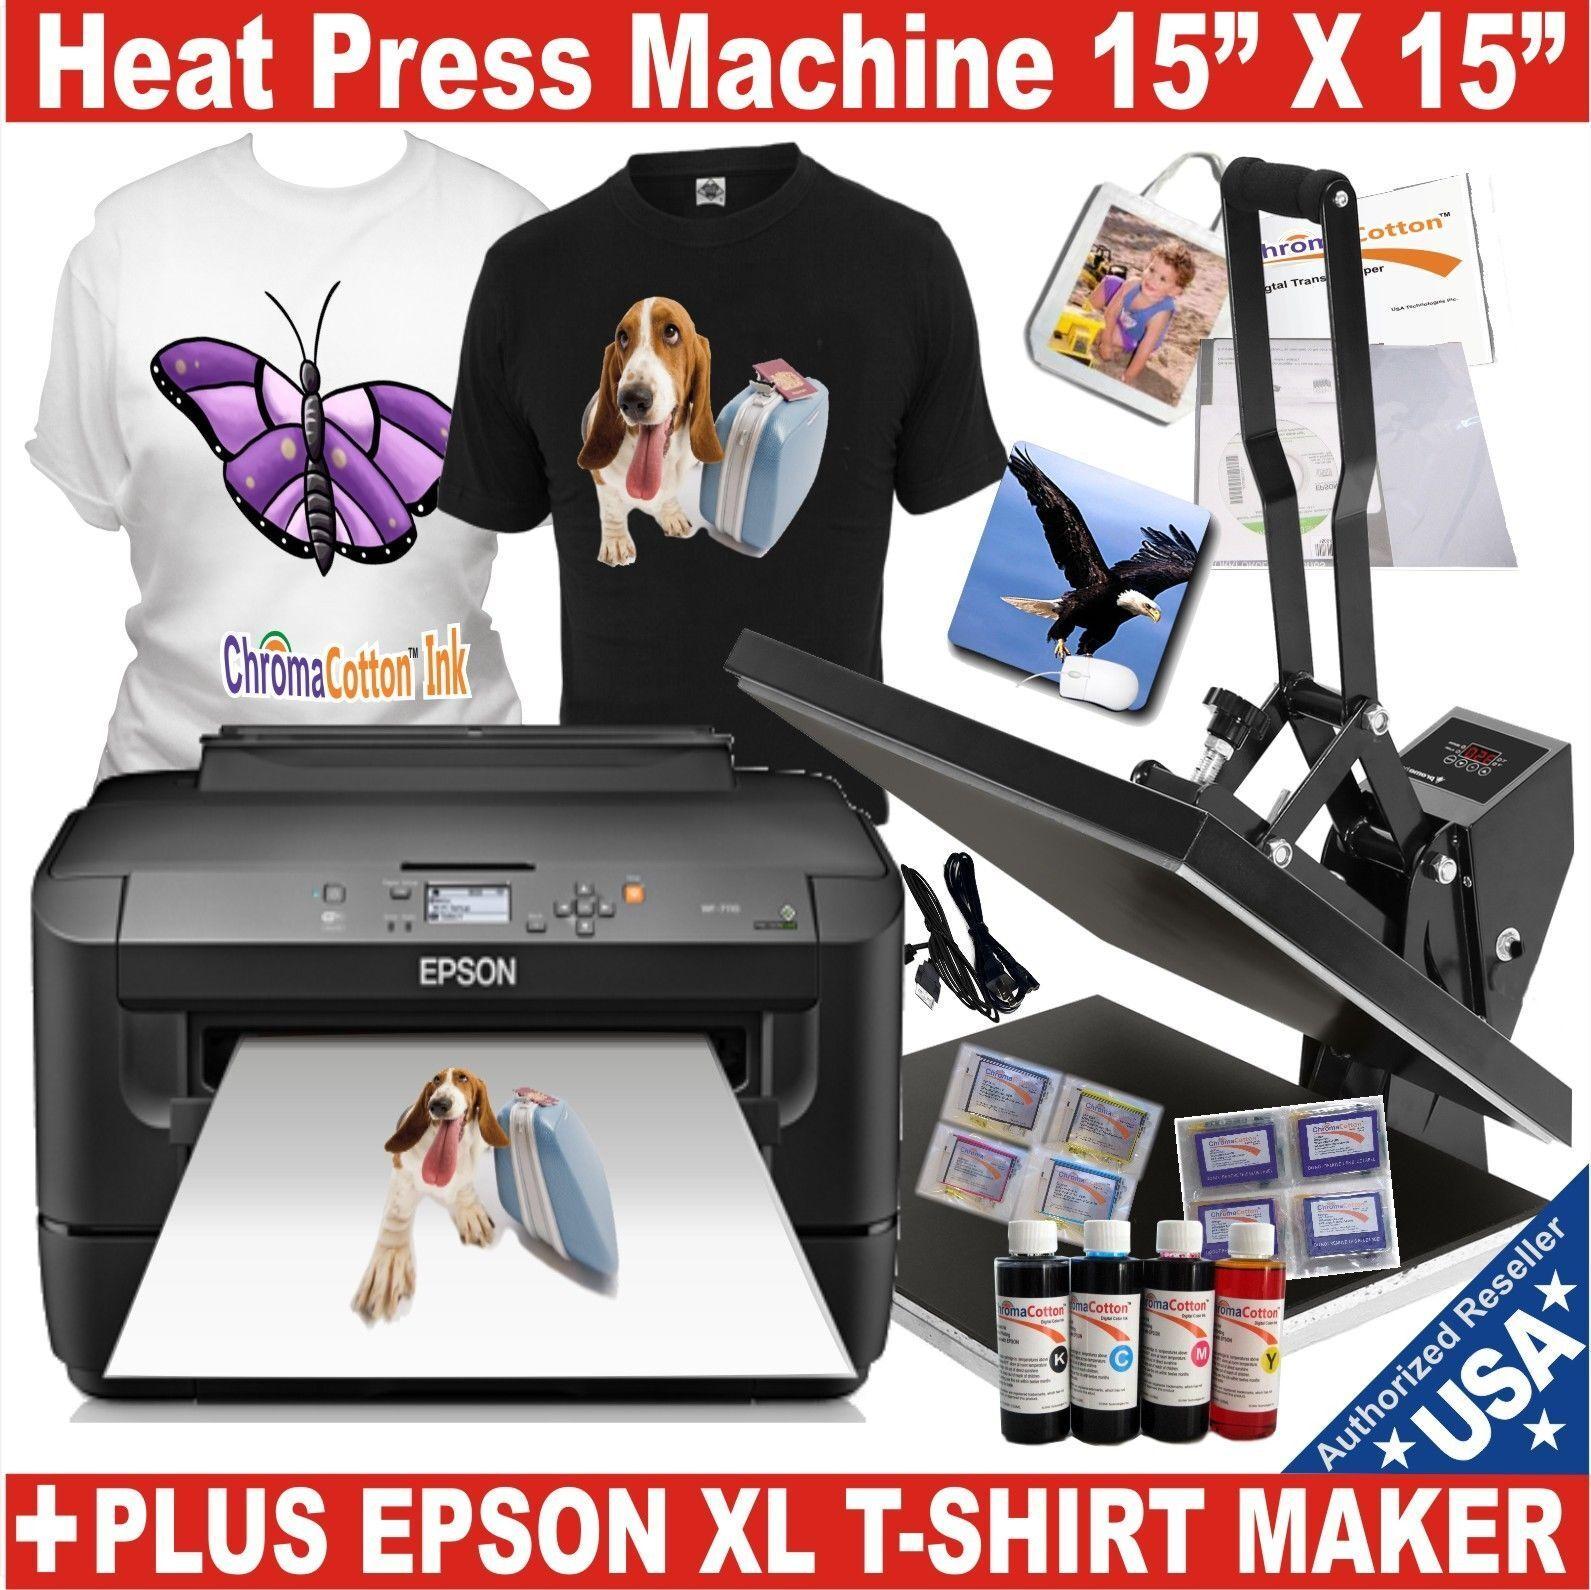 EPSON WF-XL PRINTER PLUS HEAT PRESS TRANSFER T-SHIRT MAKER